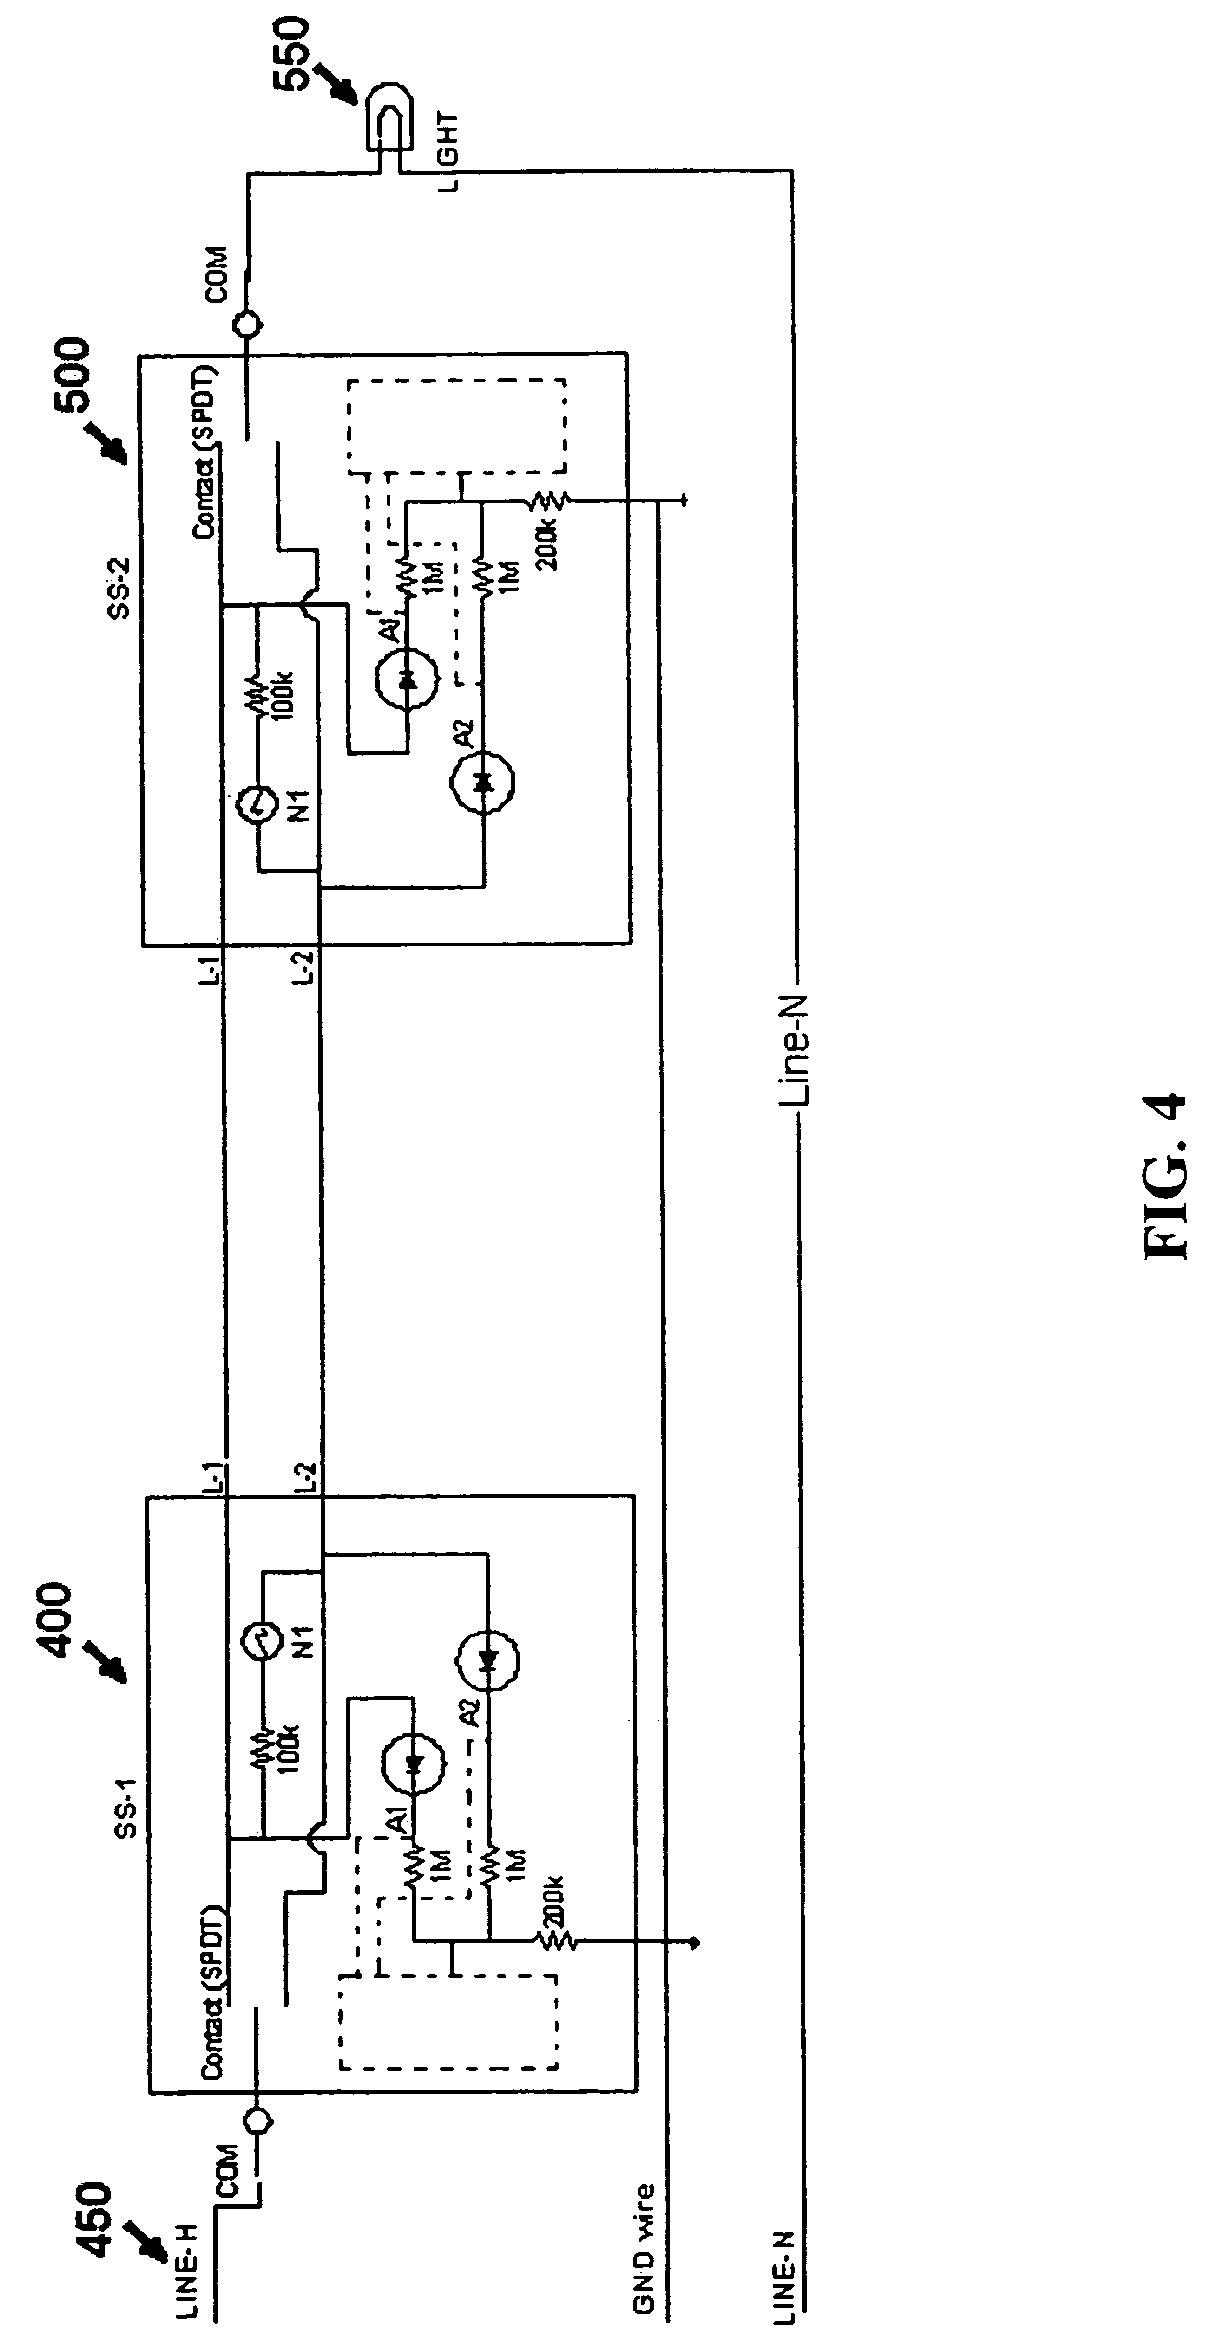 light sensor switch circuit diagram 2006 dodge ram 1500 factory radio wiring 3 way motion new